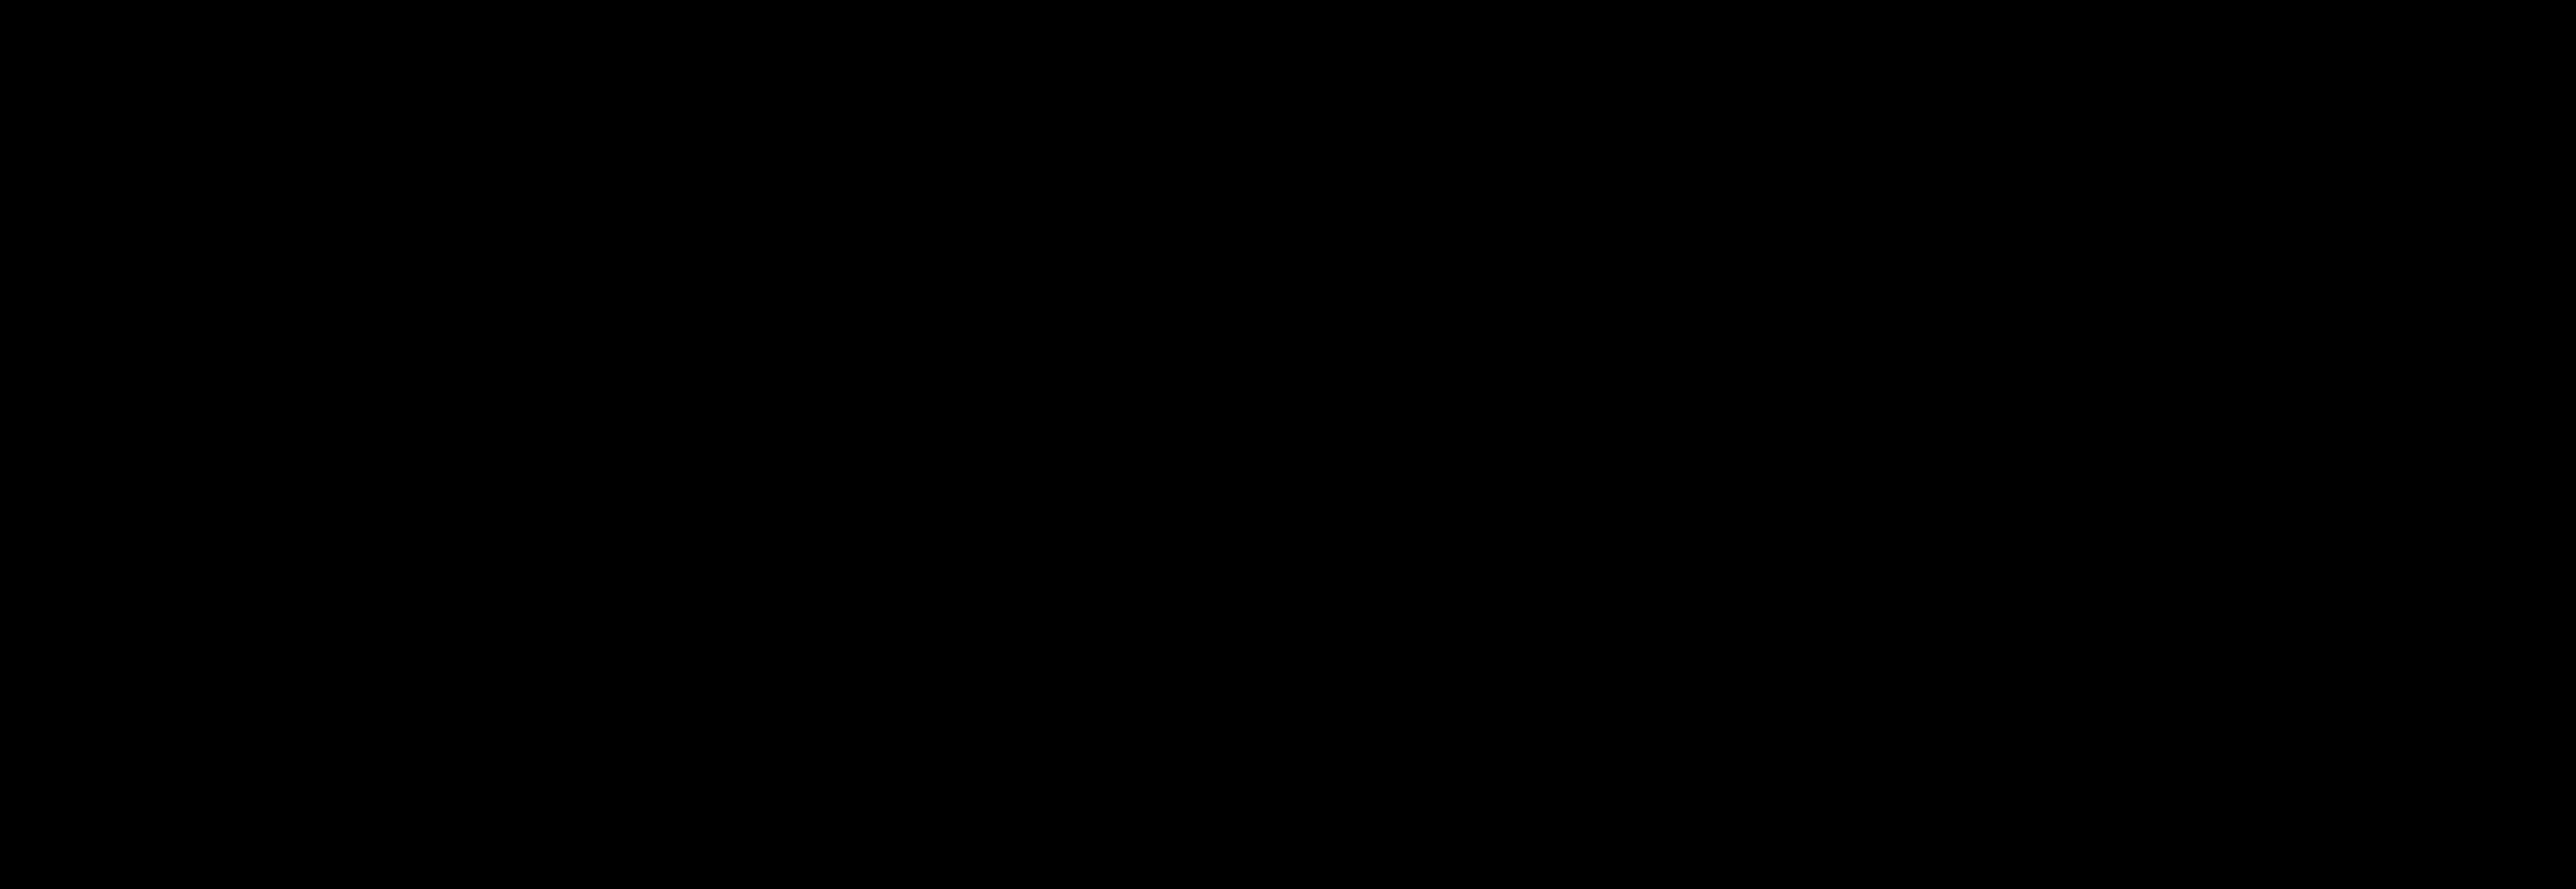 「pro-ject logo」の画像検索結果